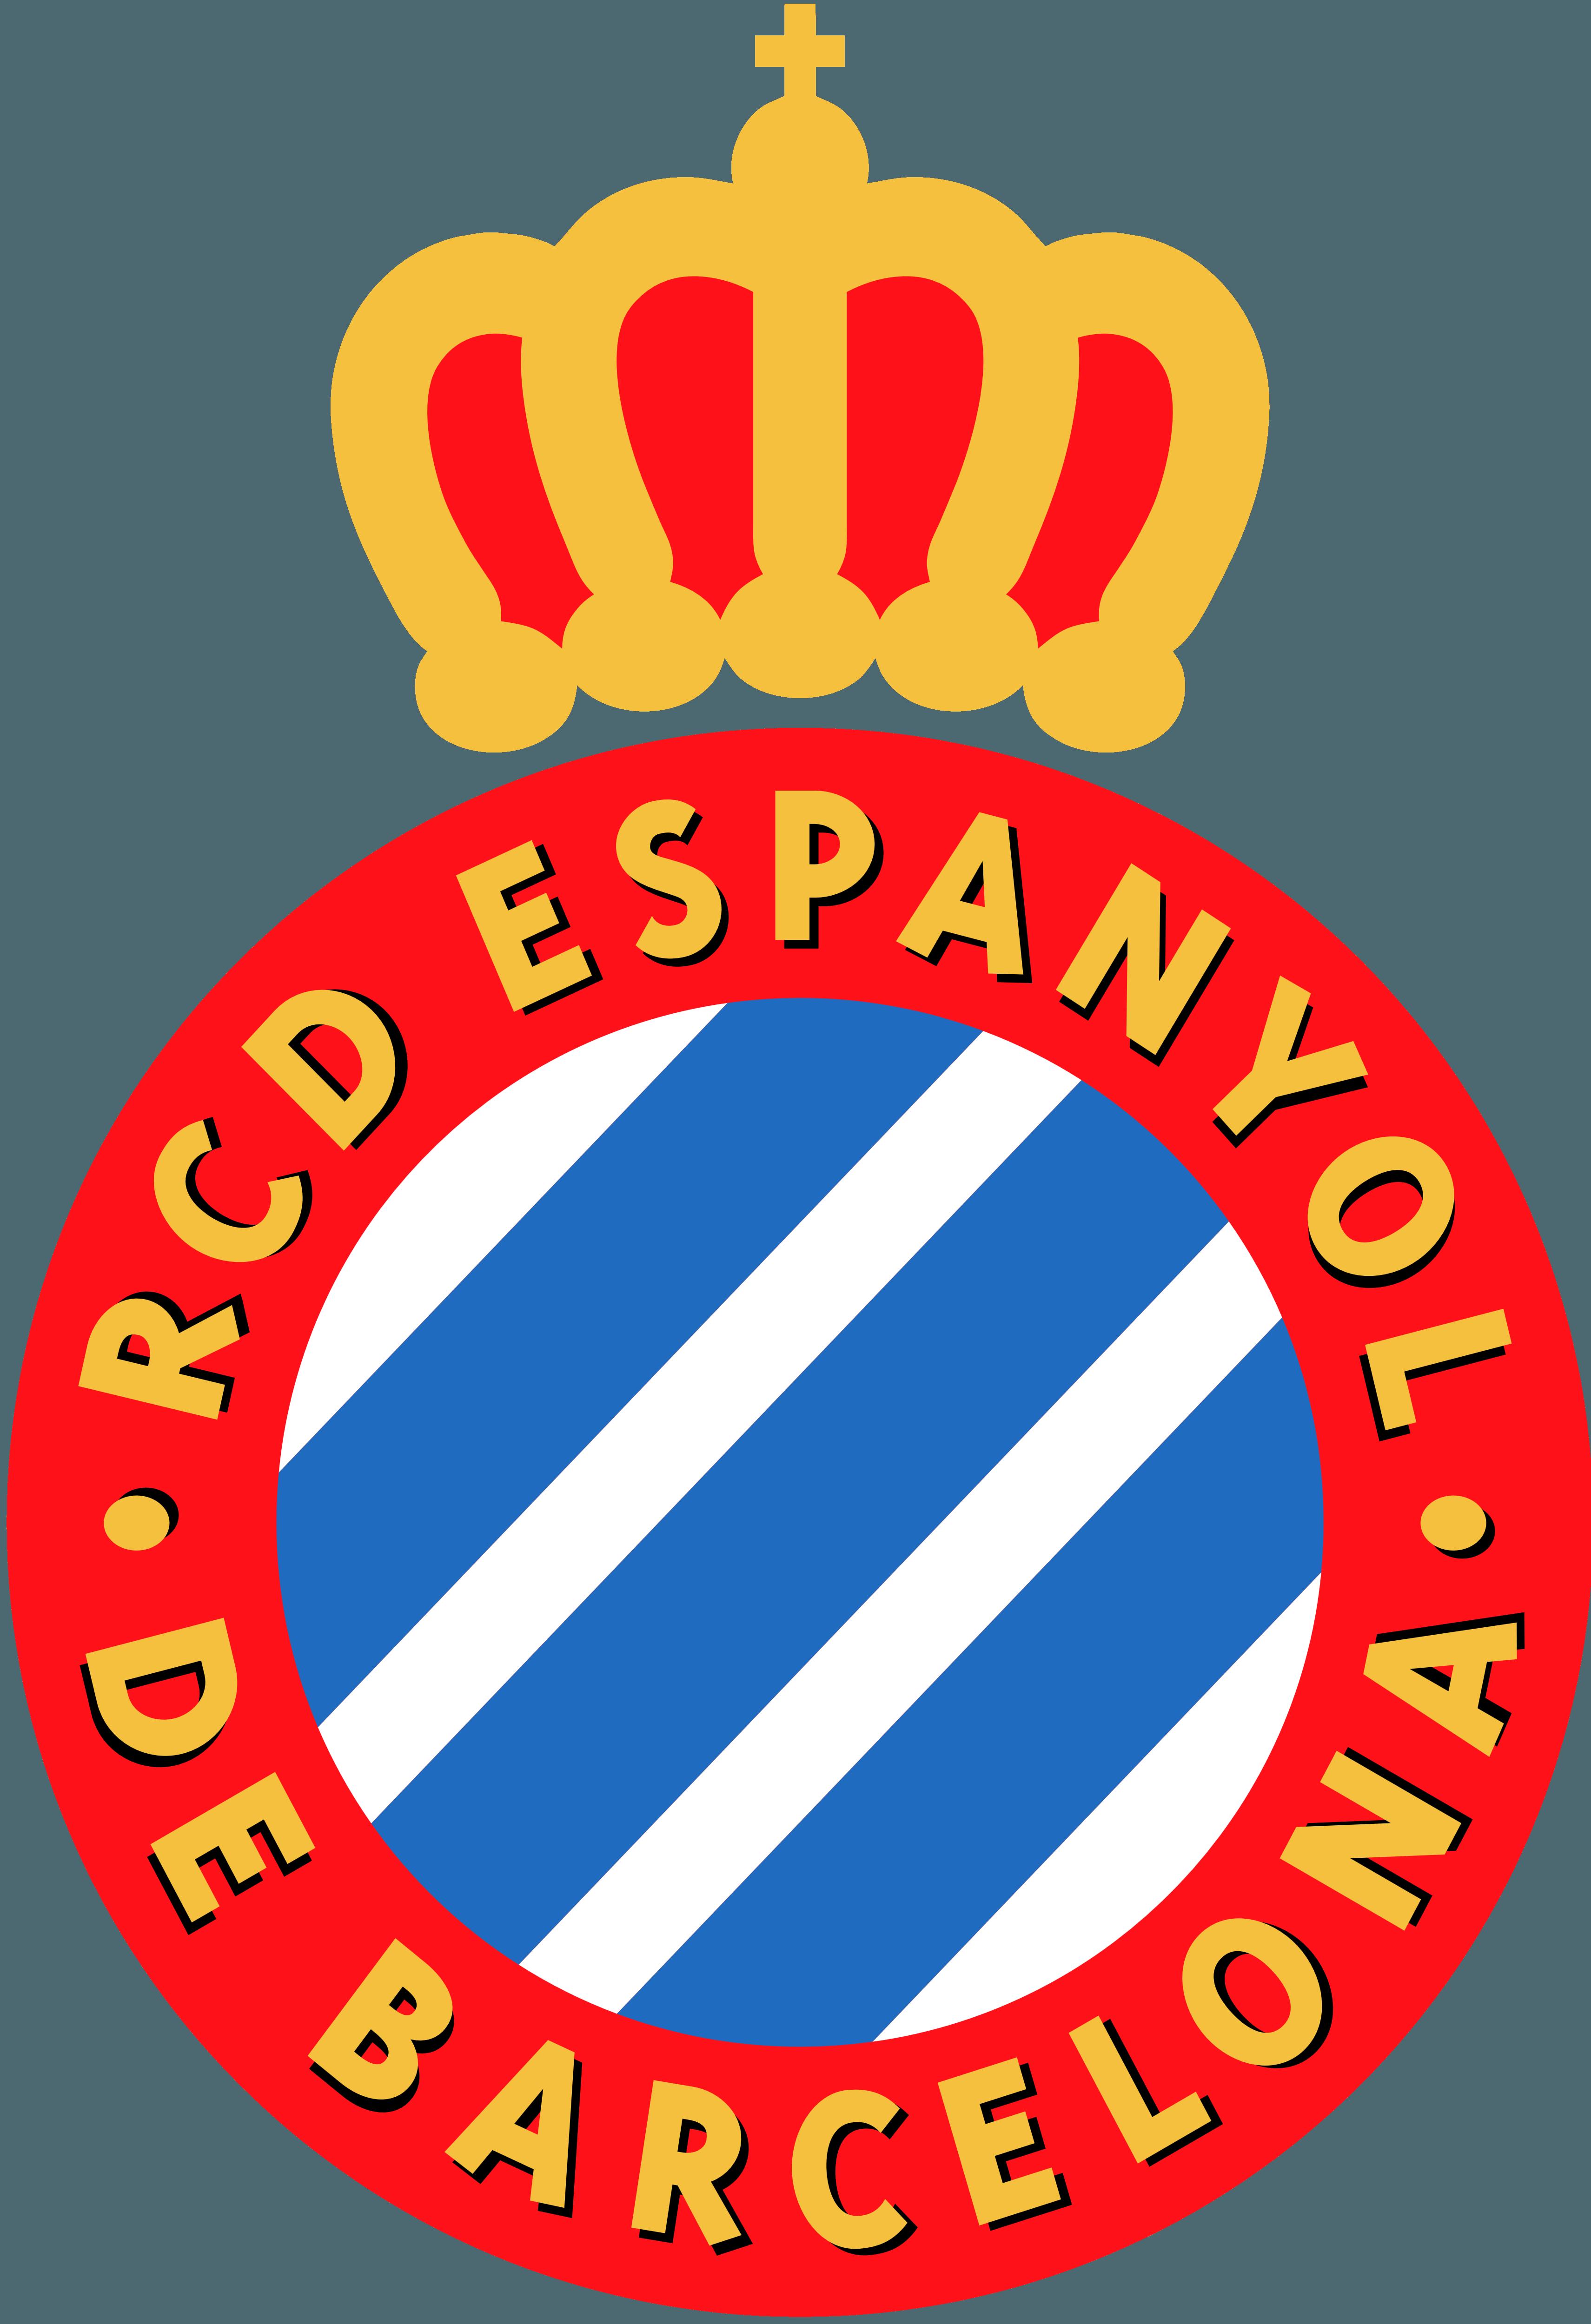 Rcd Espanyol Wallpapers Wallpaper Cave